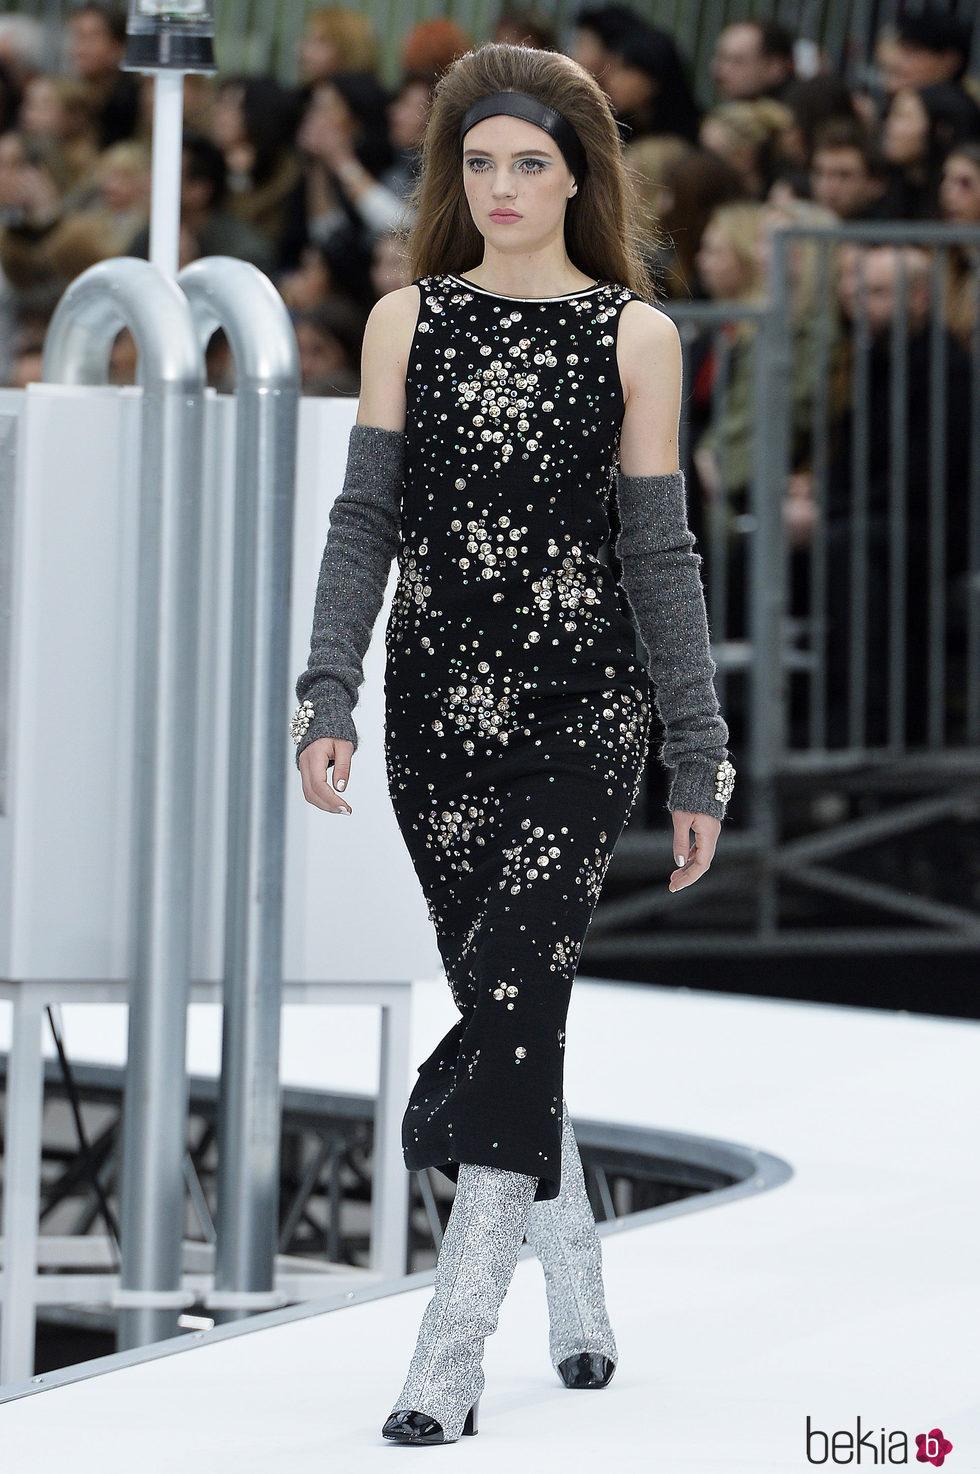 Vestido negro estampado de chanel oto o invierno 2017 2018 for Moda de otono 2017